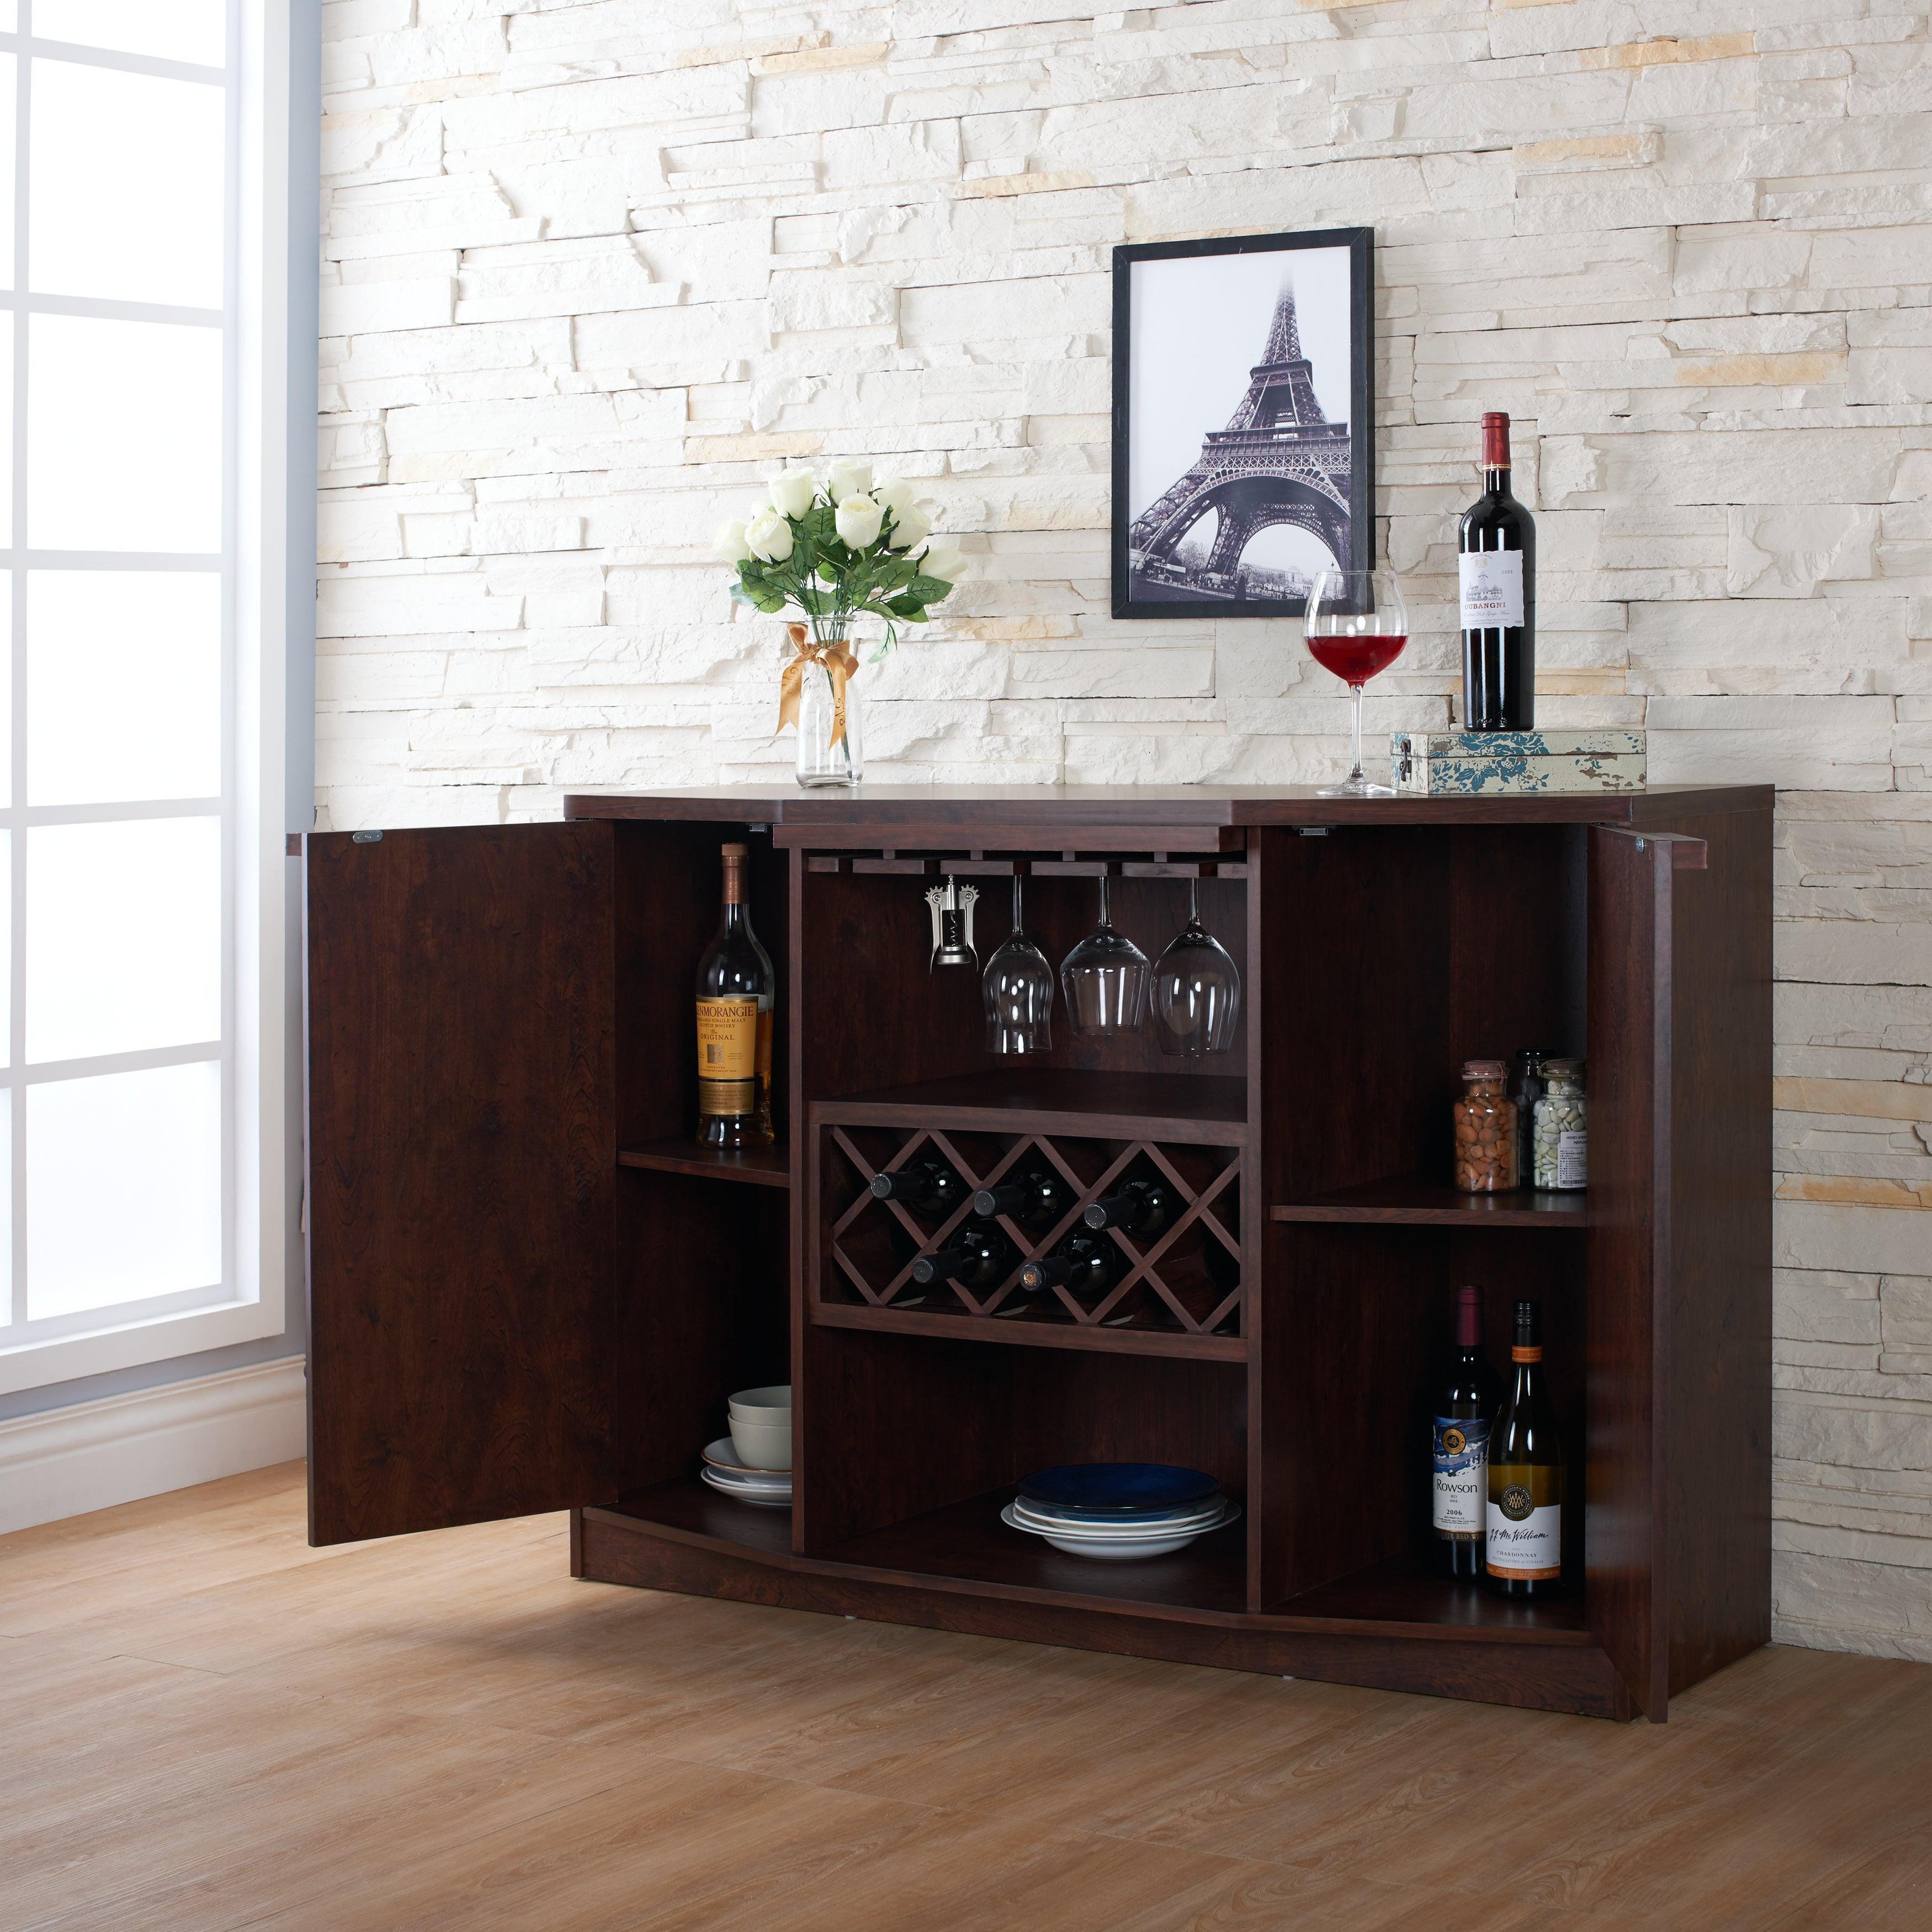 Chapline Contemporary Wine Bar Buffetfoa With Contemporary Wine Bar Buffets (View 9 of 30)